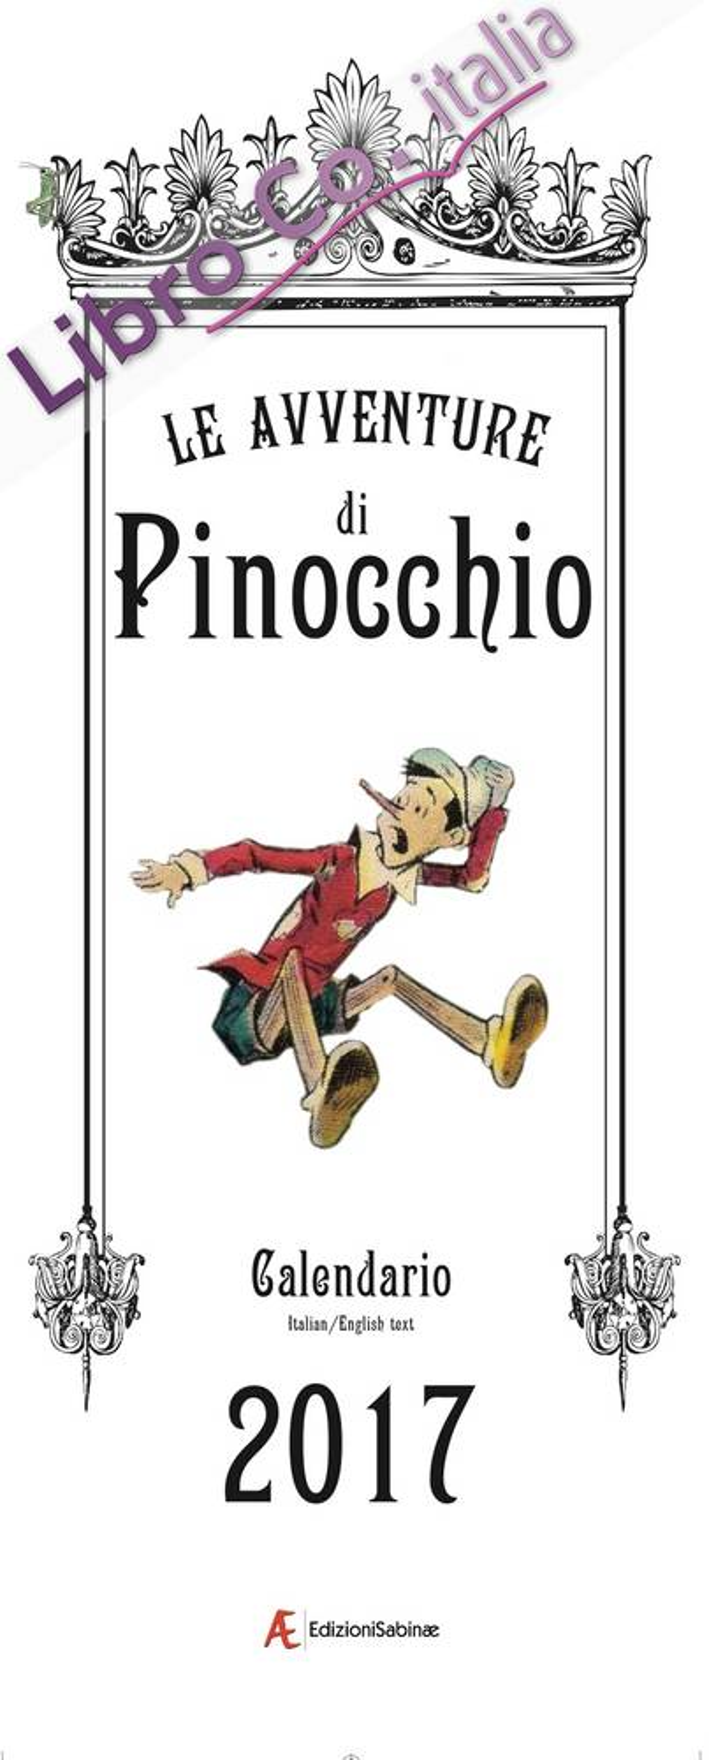 Calendario 2017 Pinocchio. Ediz. Italiana e Inglese